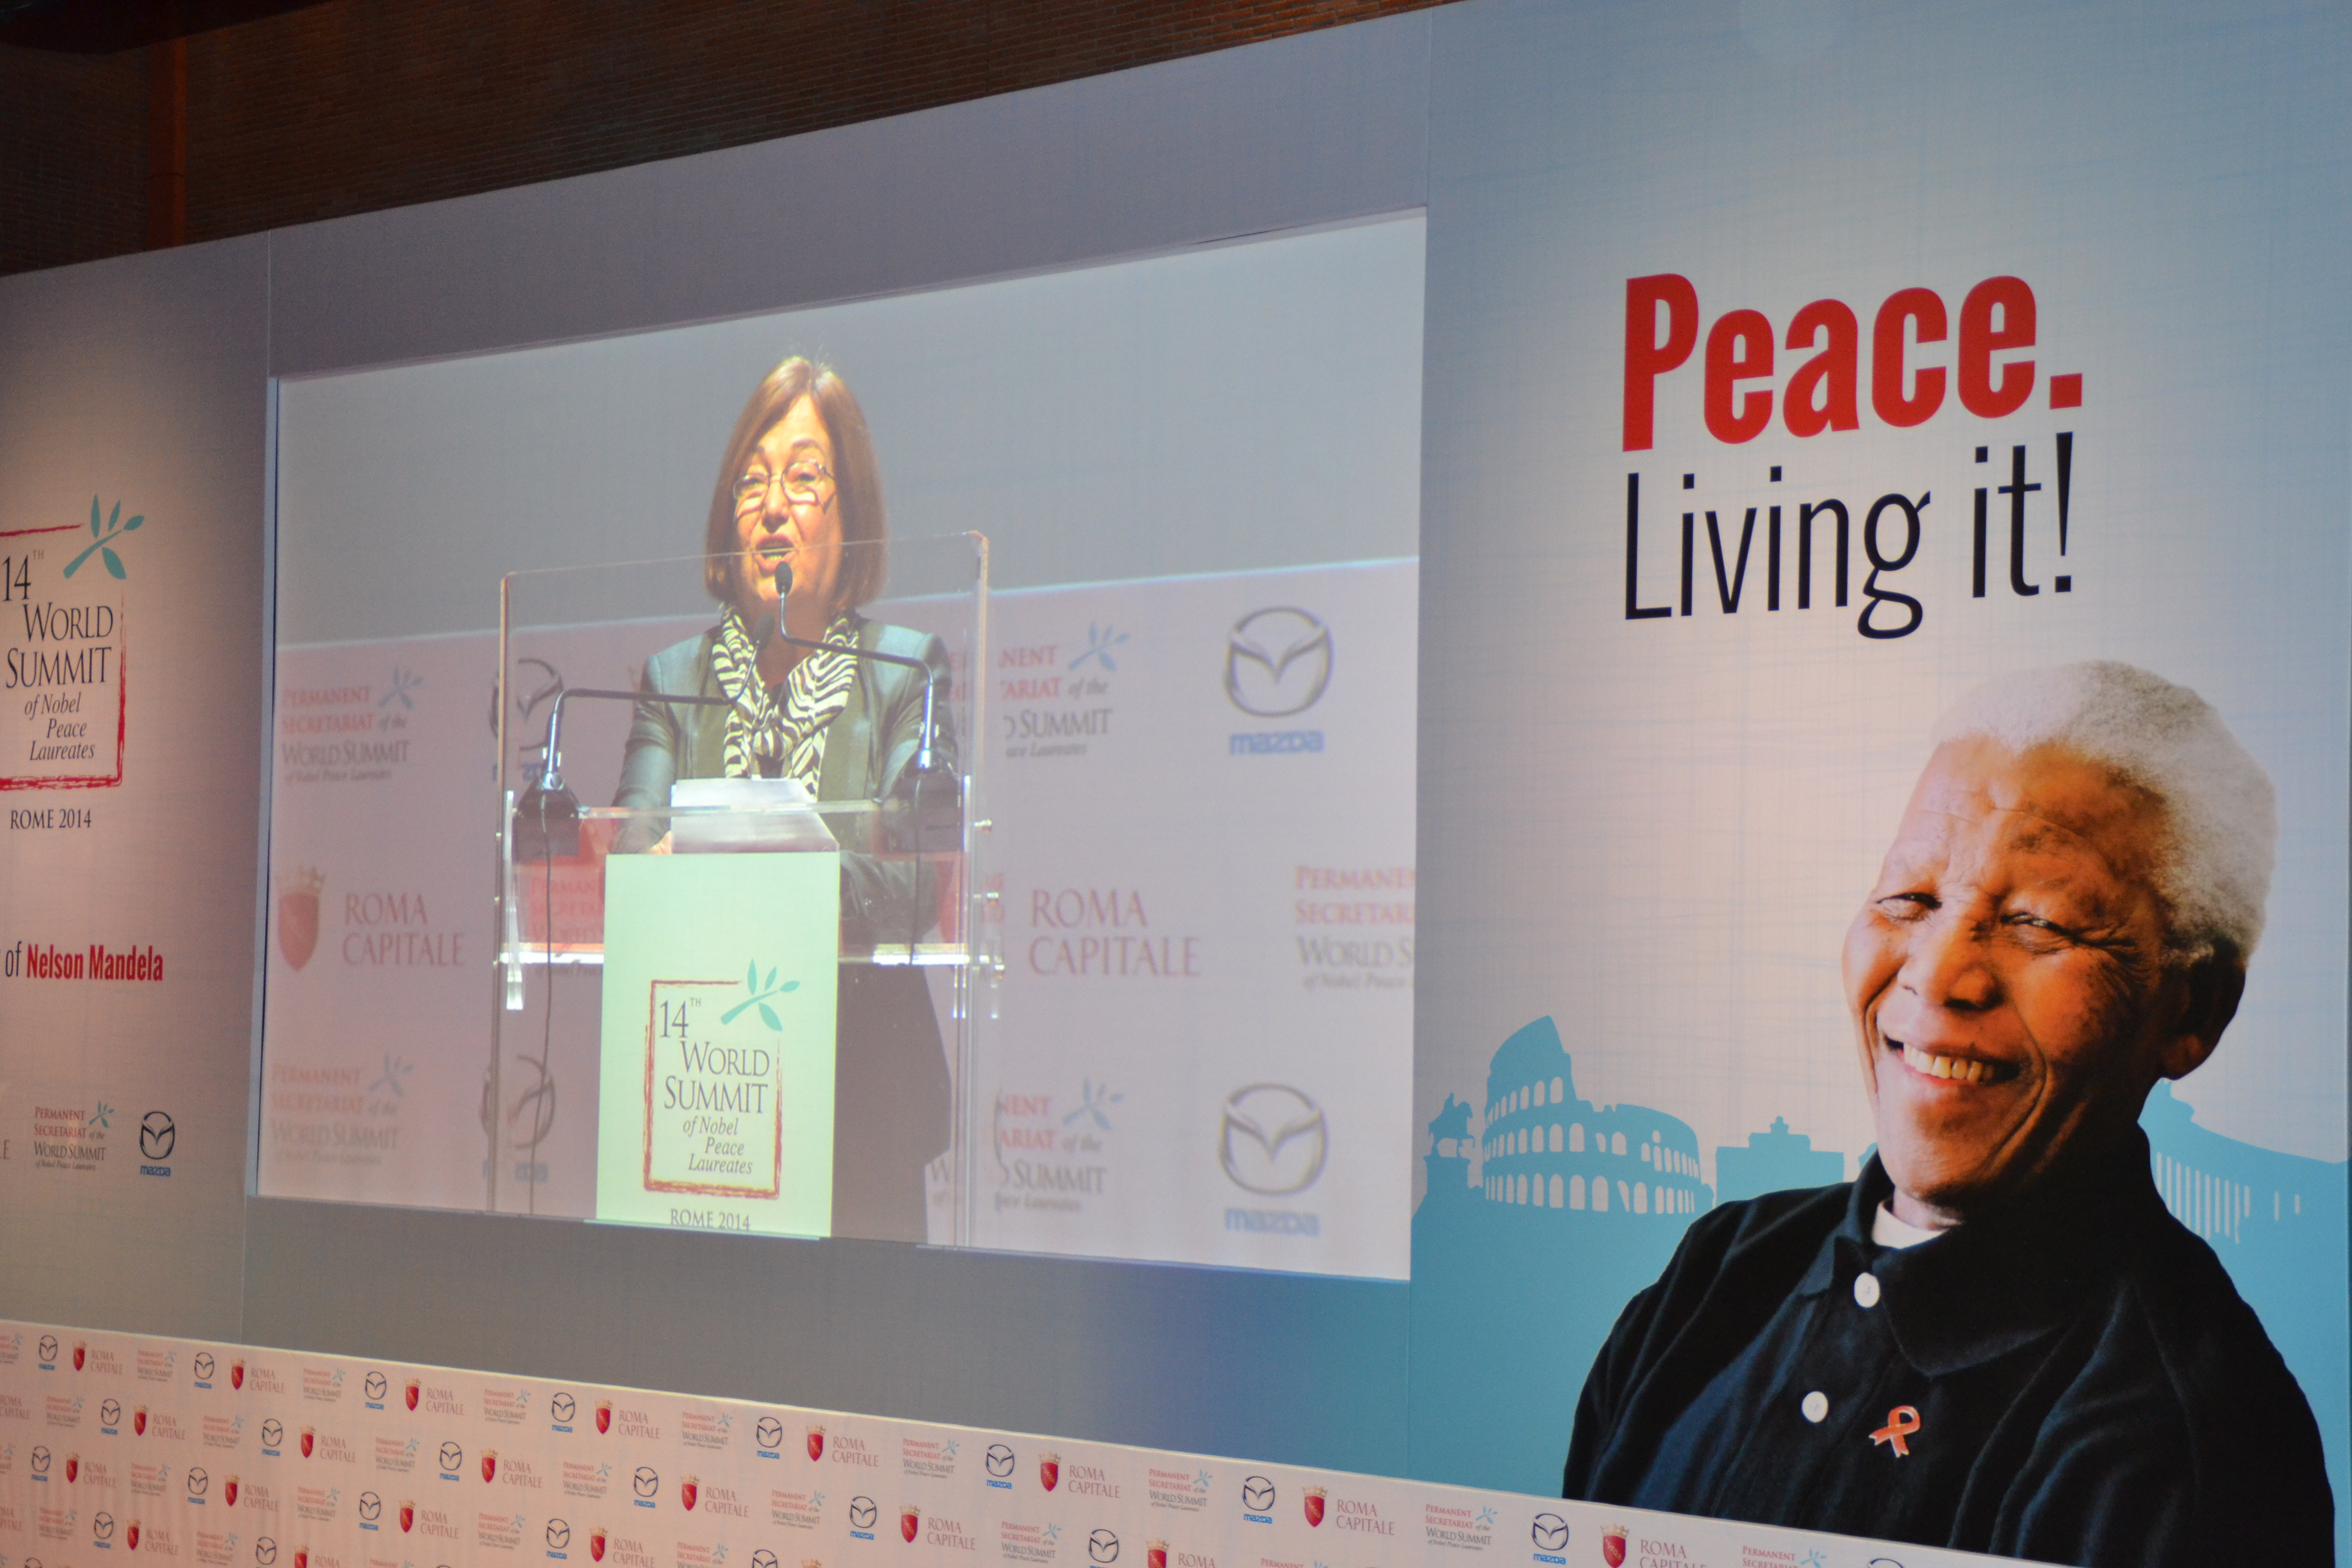 Summit dei Nobel: intervista a Mairead Maguire